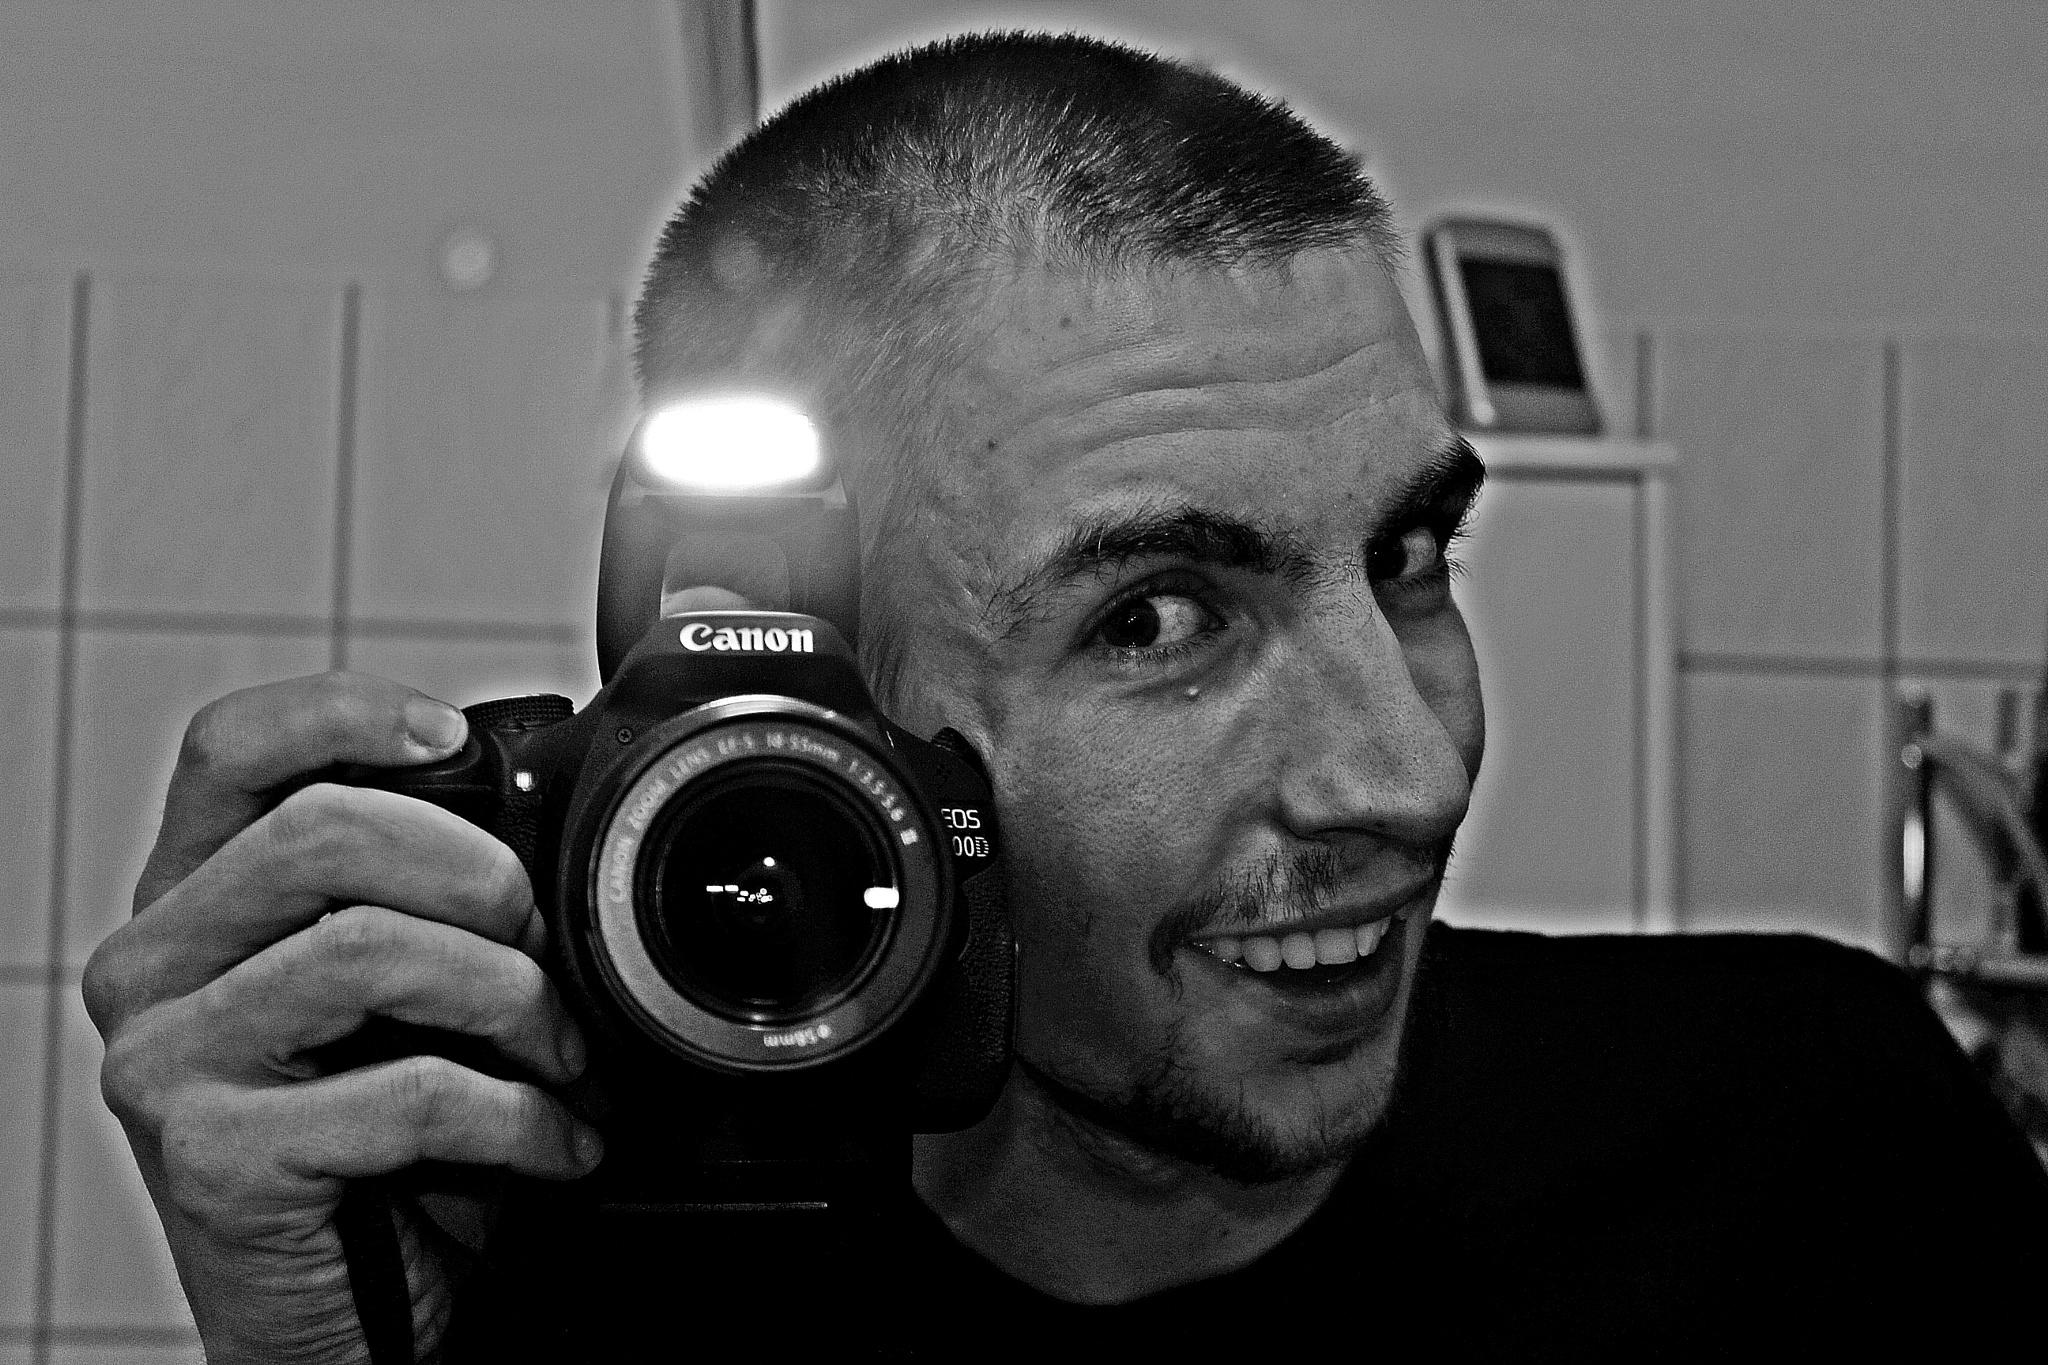 Happy Hobbyphotographer by OOOPPP